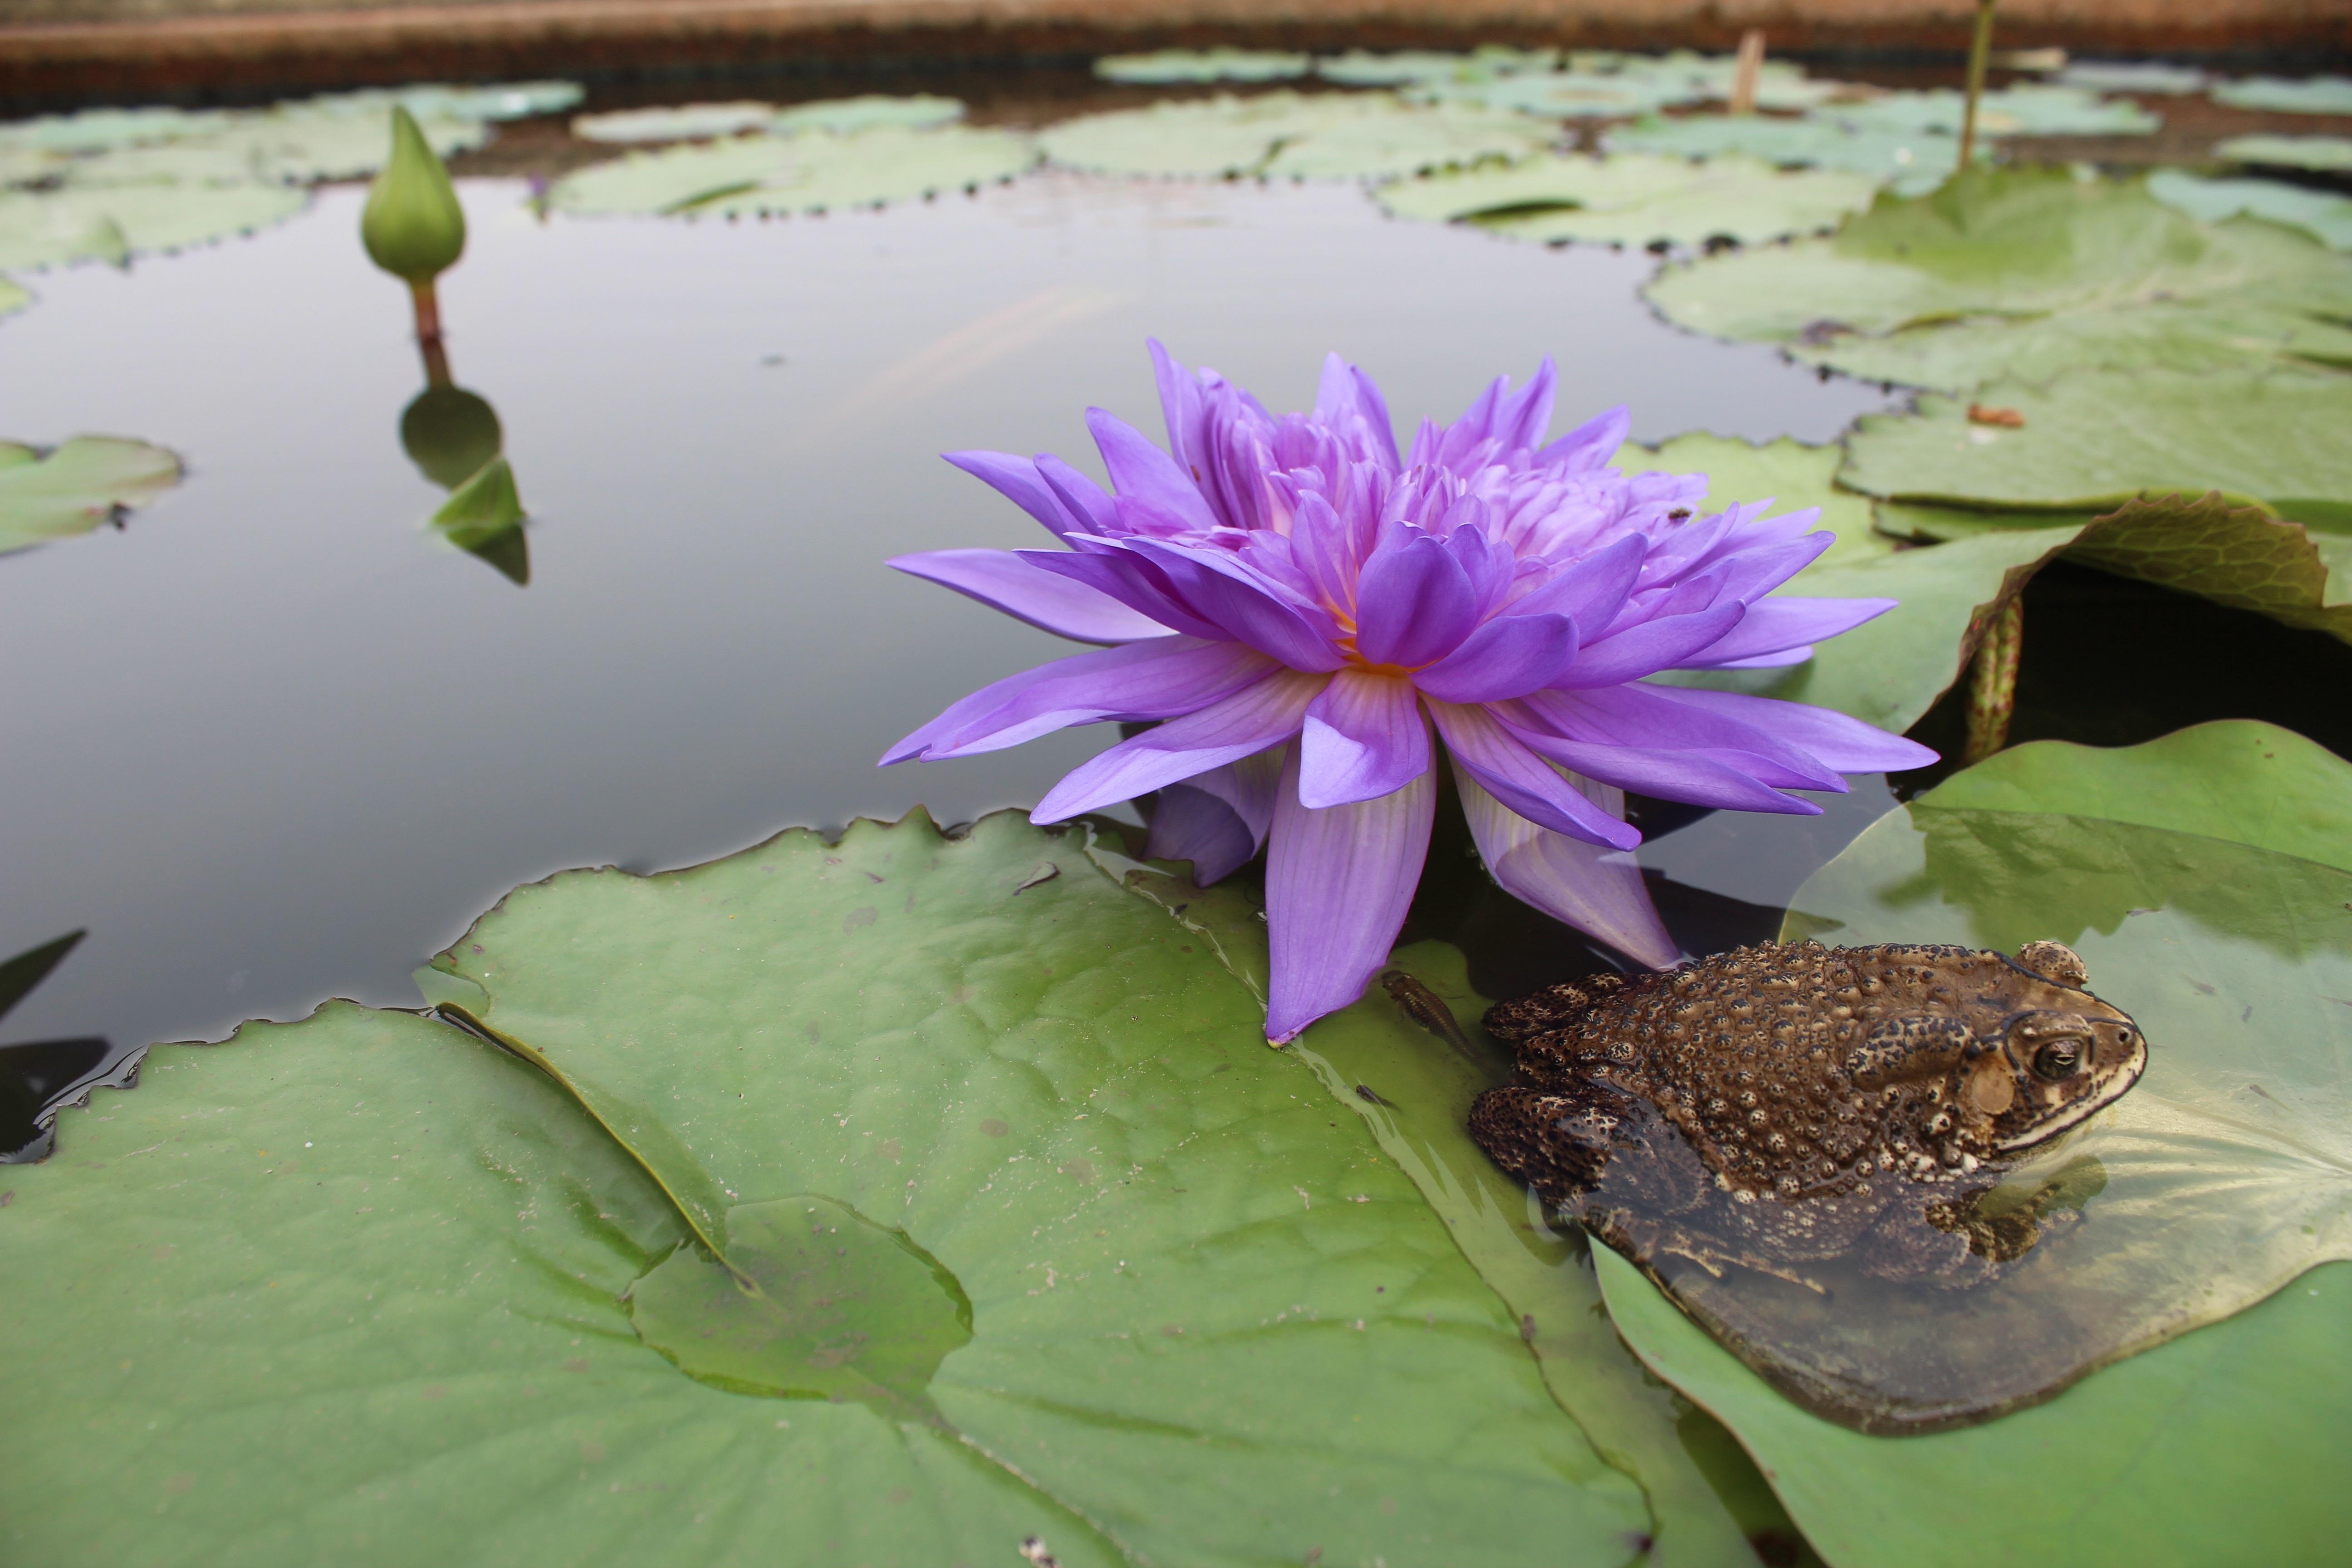 жаба на лотосе фото пошиве медведей-репликантов